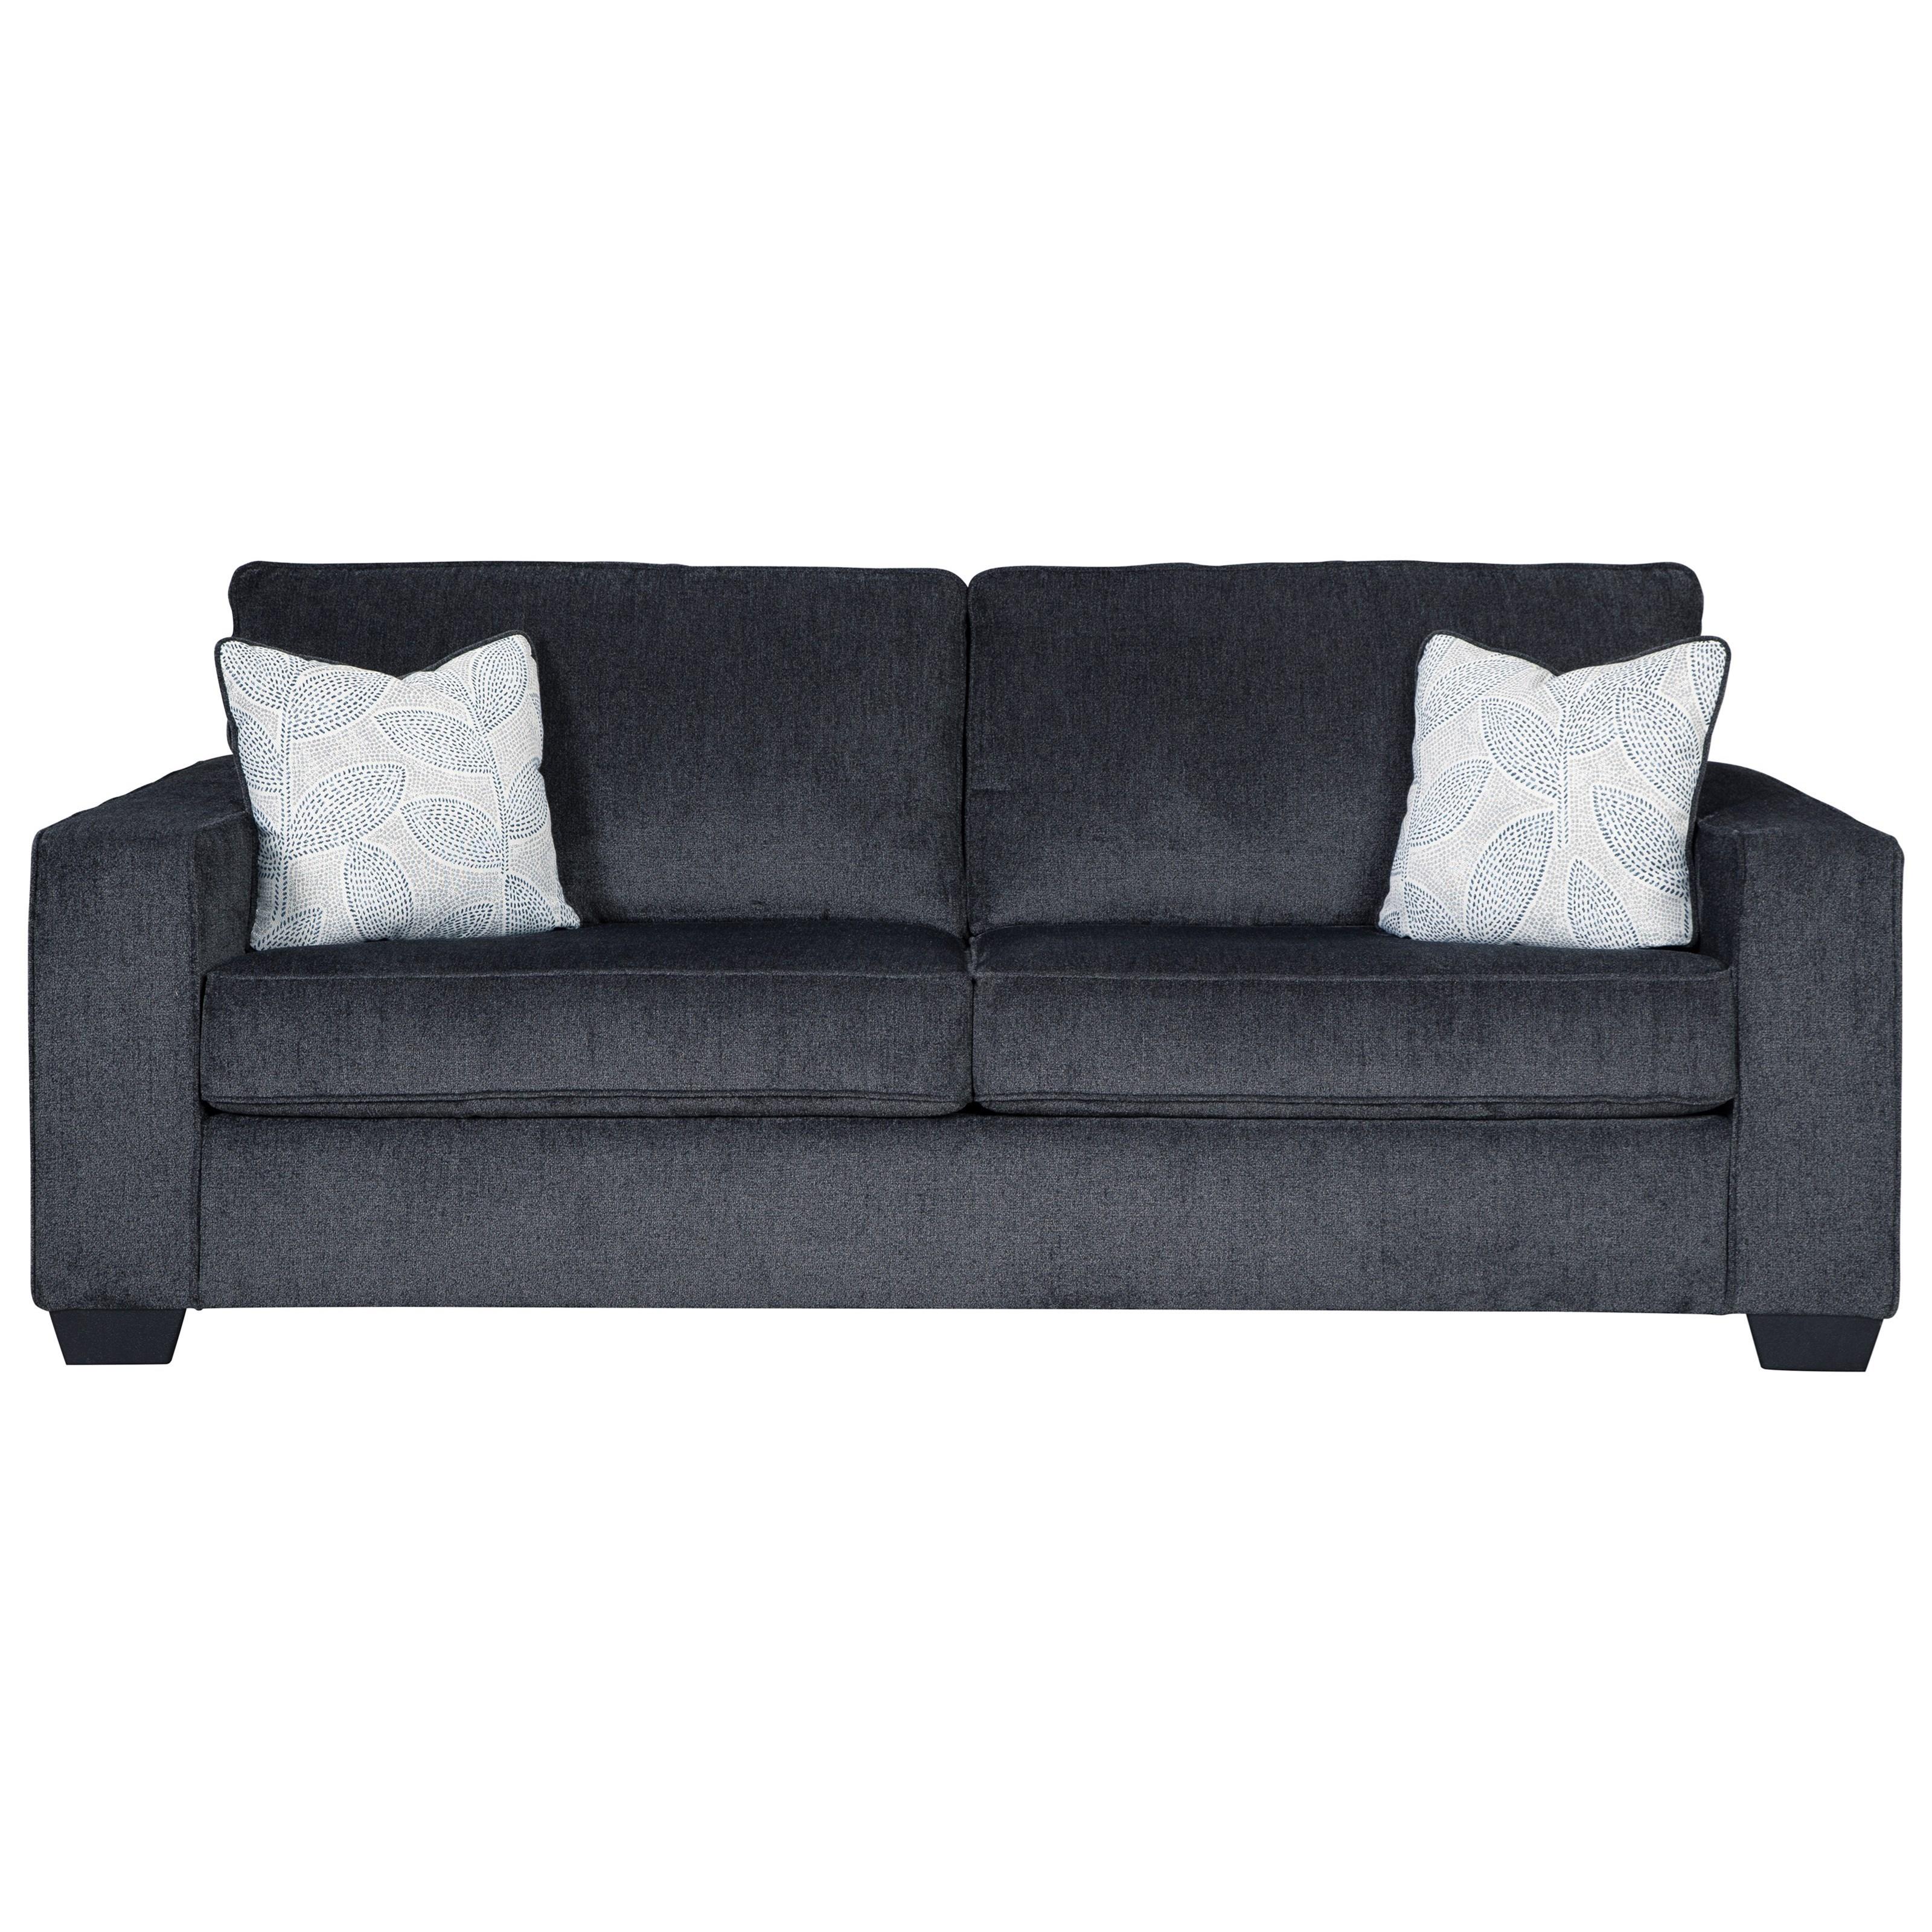 foam sofa sleeper ikat signature design by ashley altari queen with memory